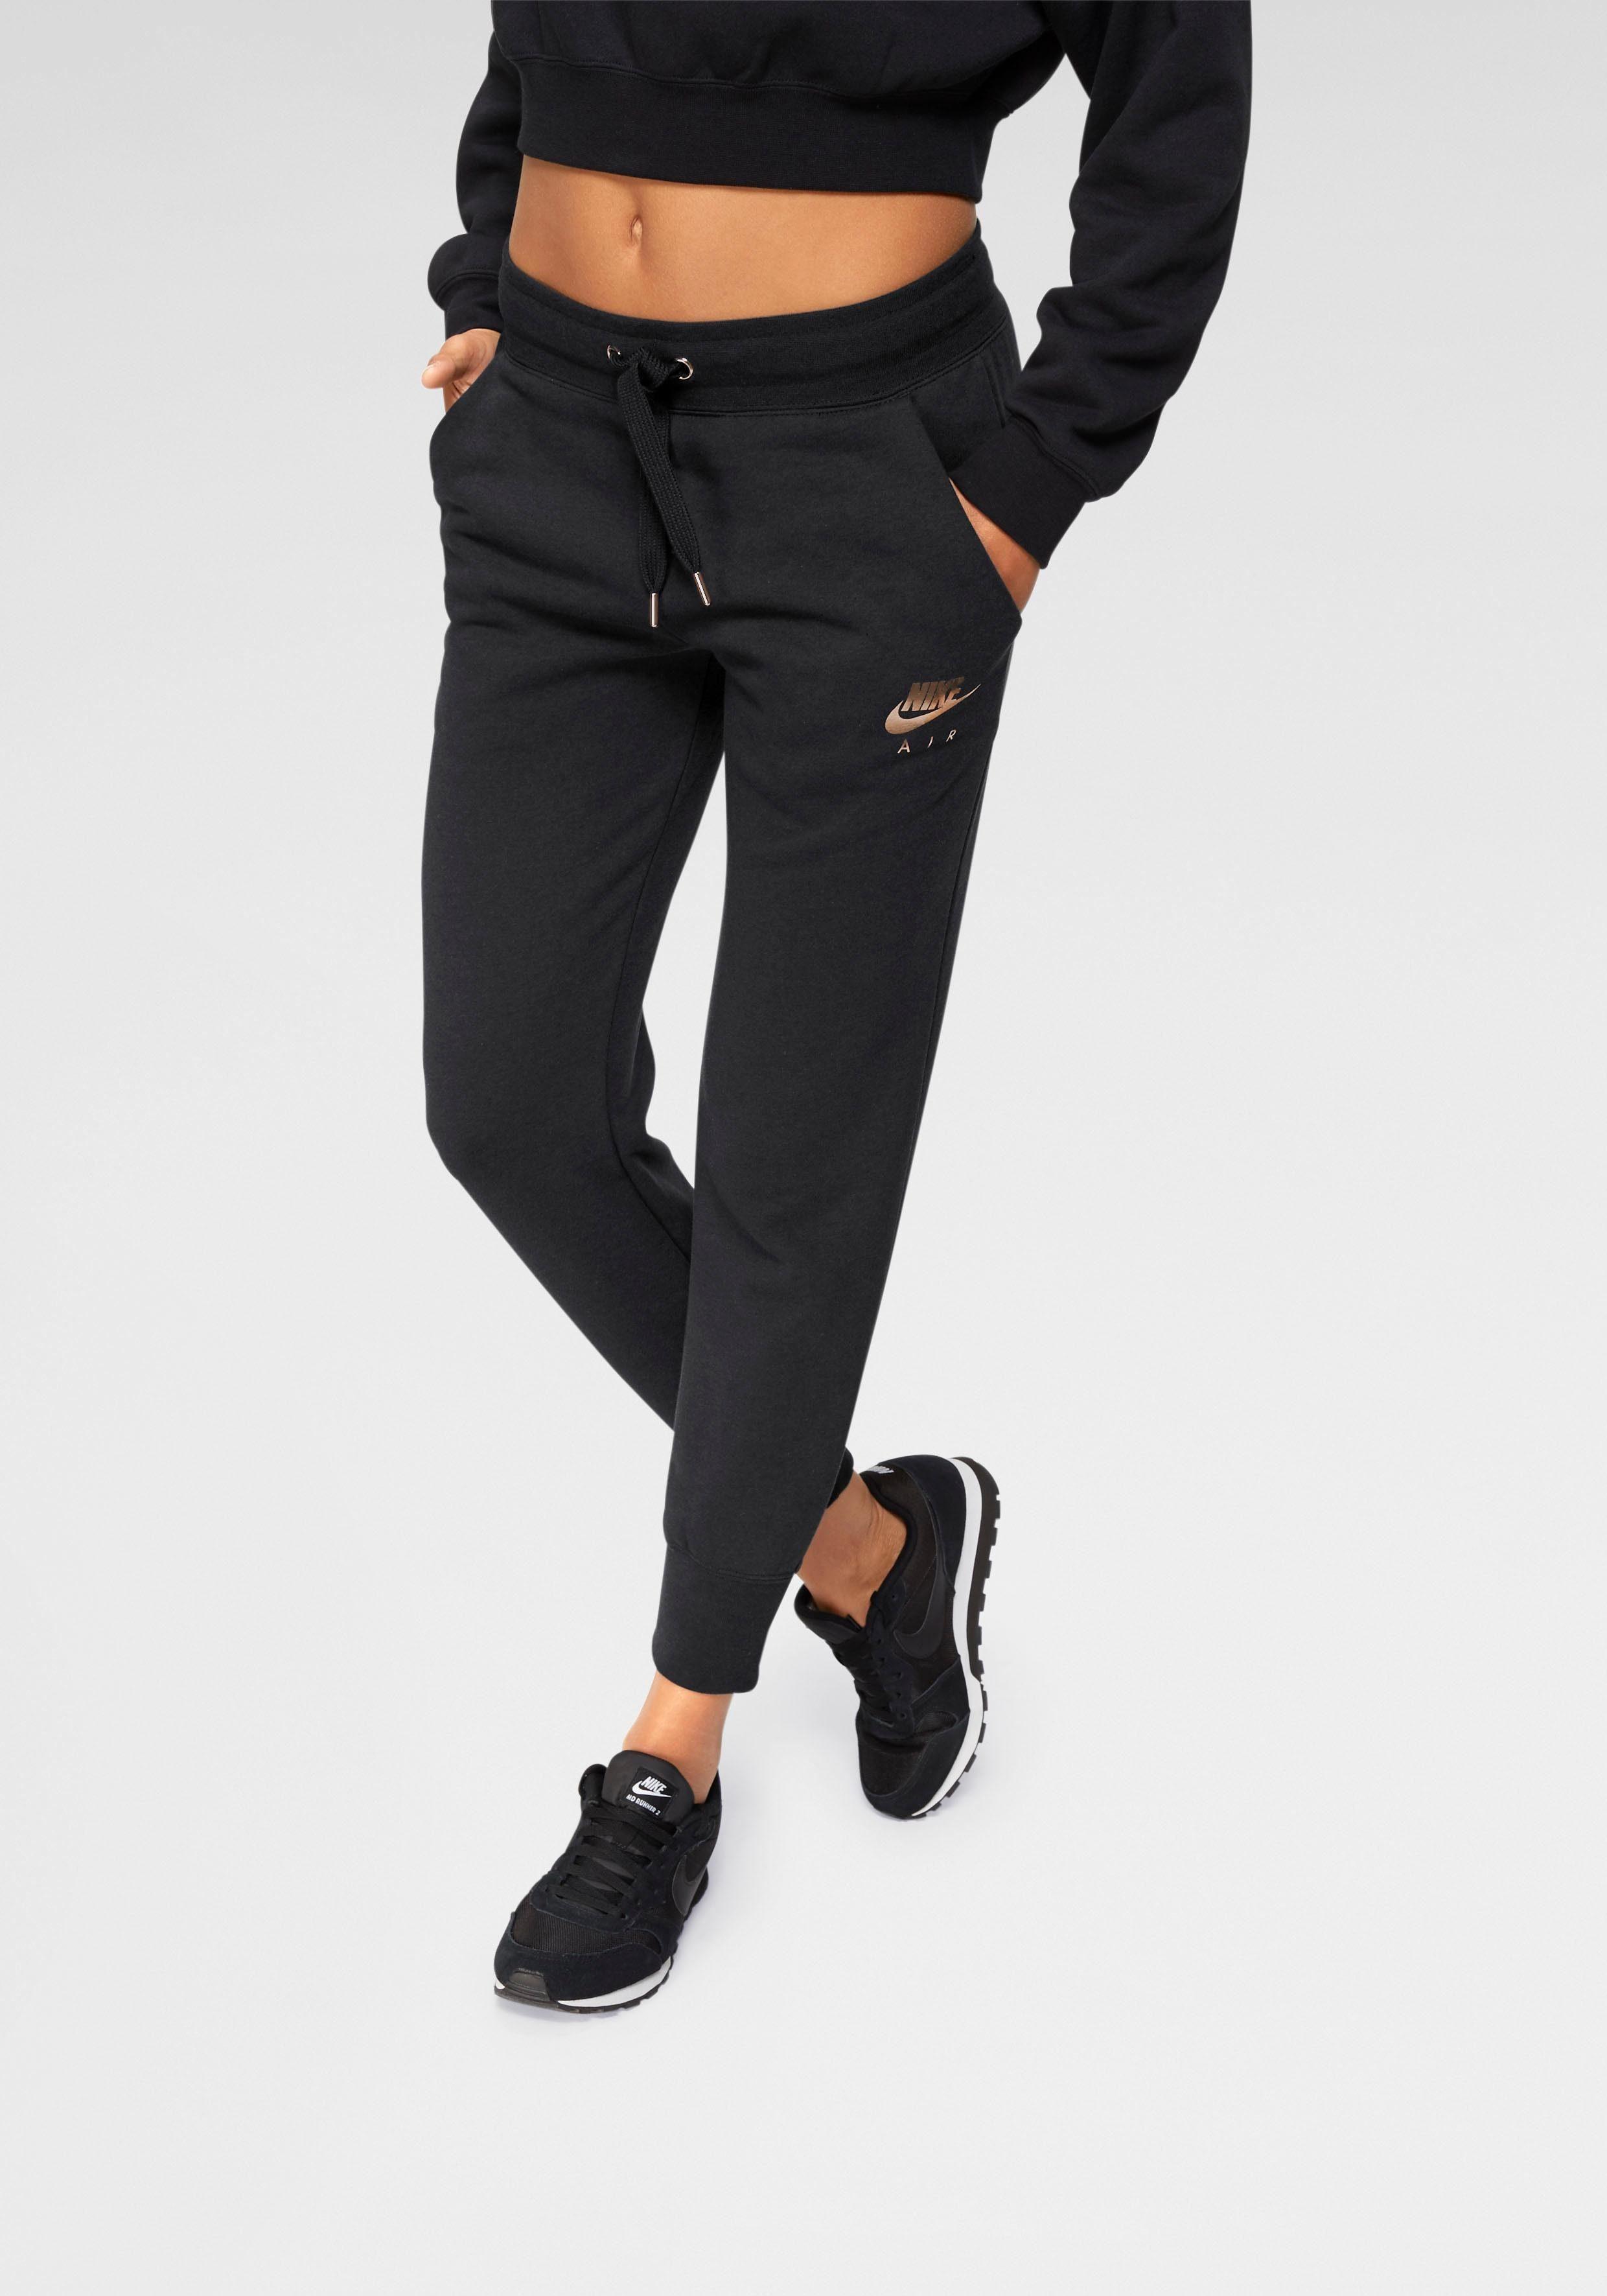 Nike Sportswear Jogginghose, Glänzender Logoprint online kaufen | OTTO